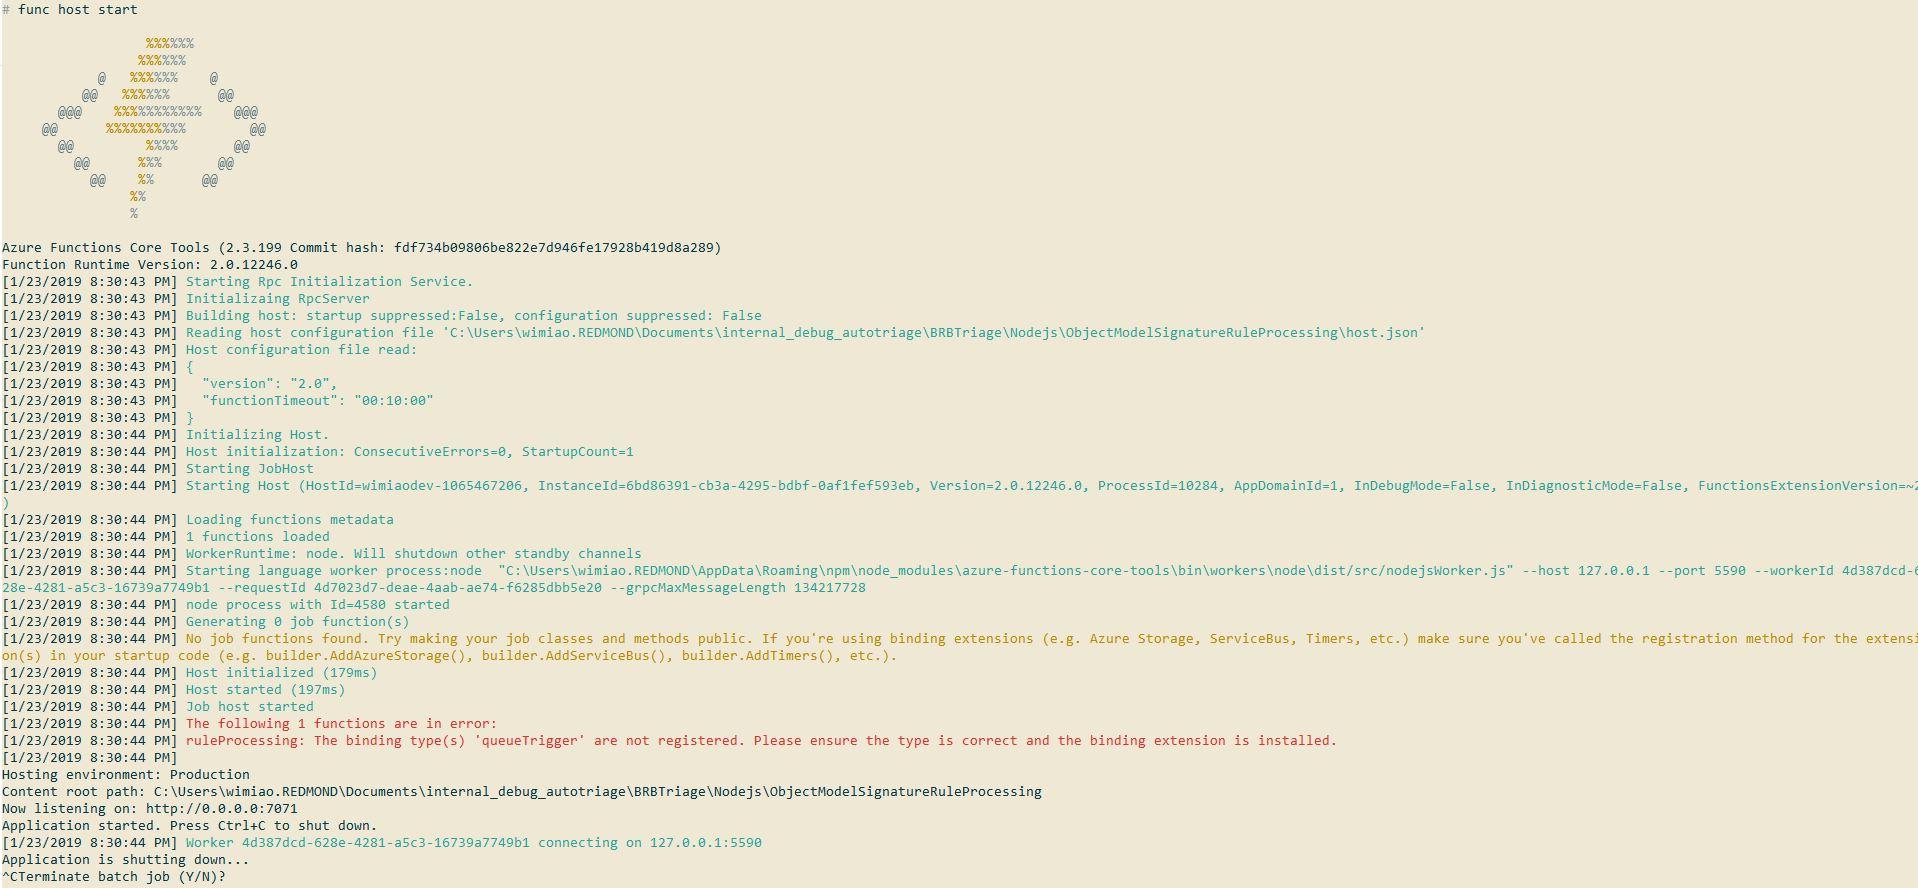 azure functions core tools v2 no longer recognizes my queue